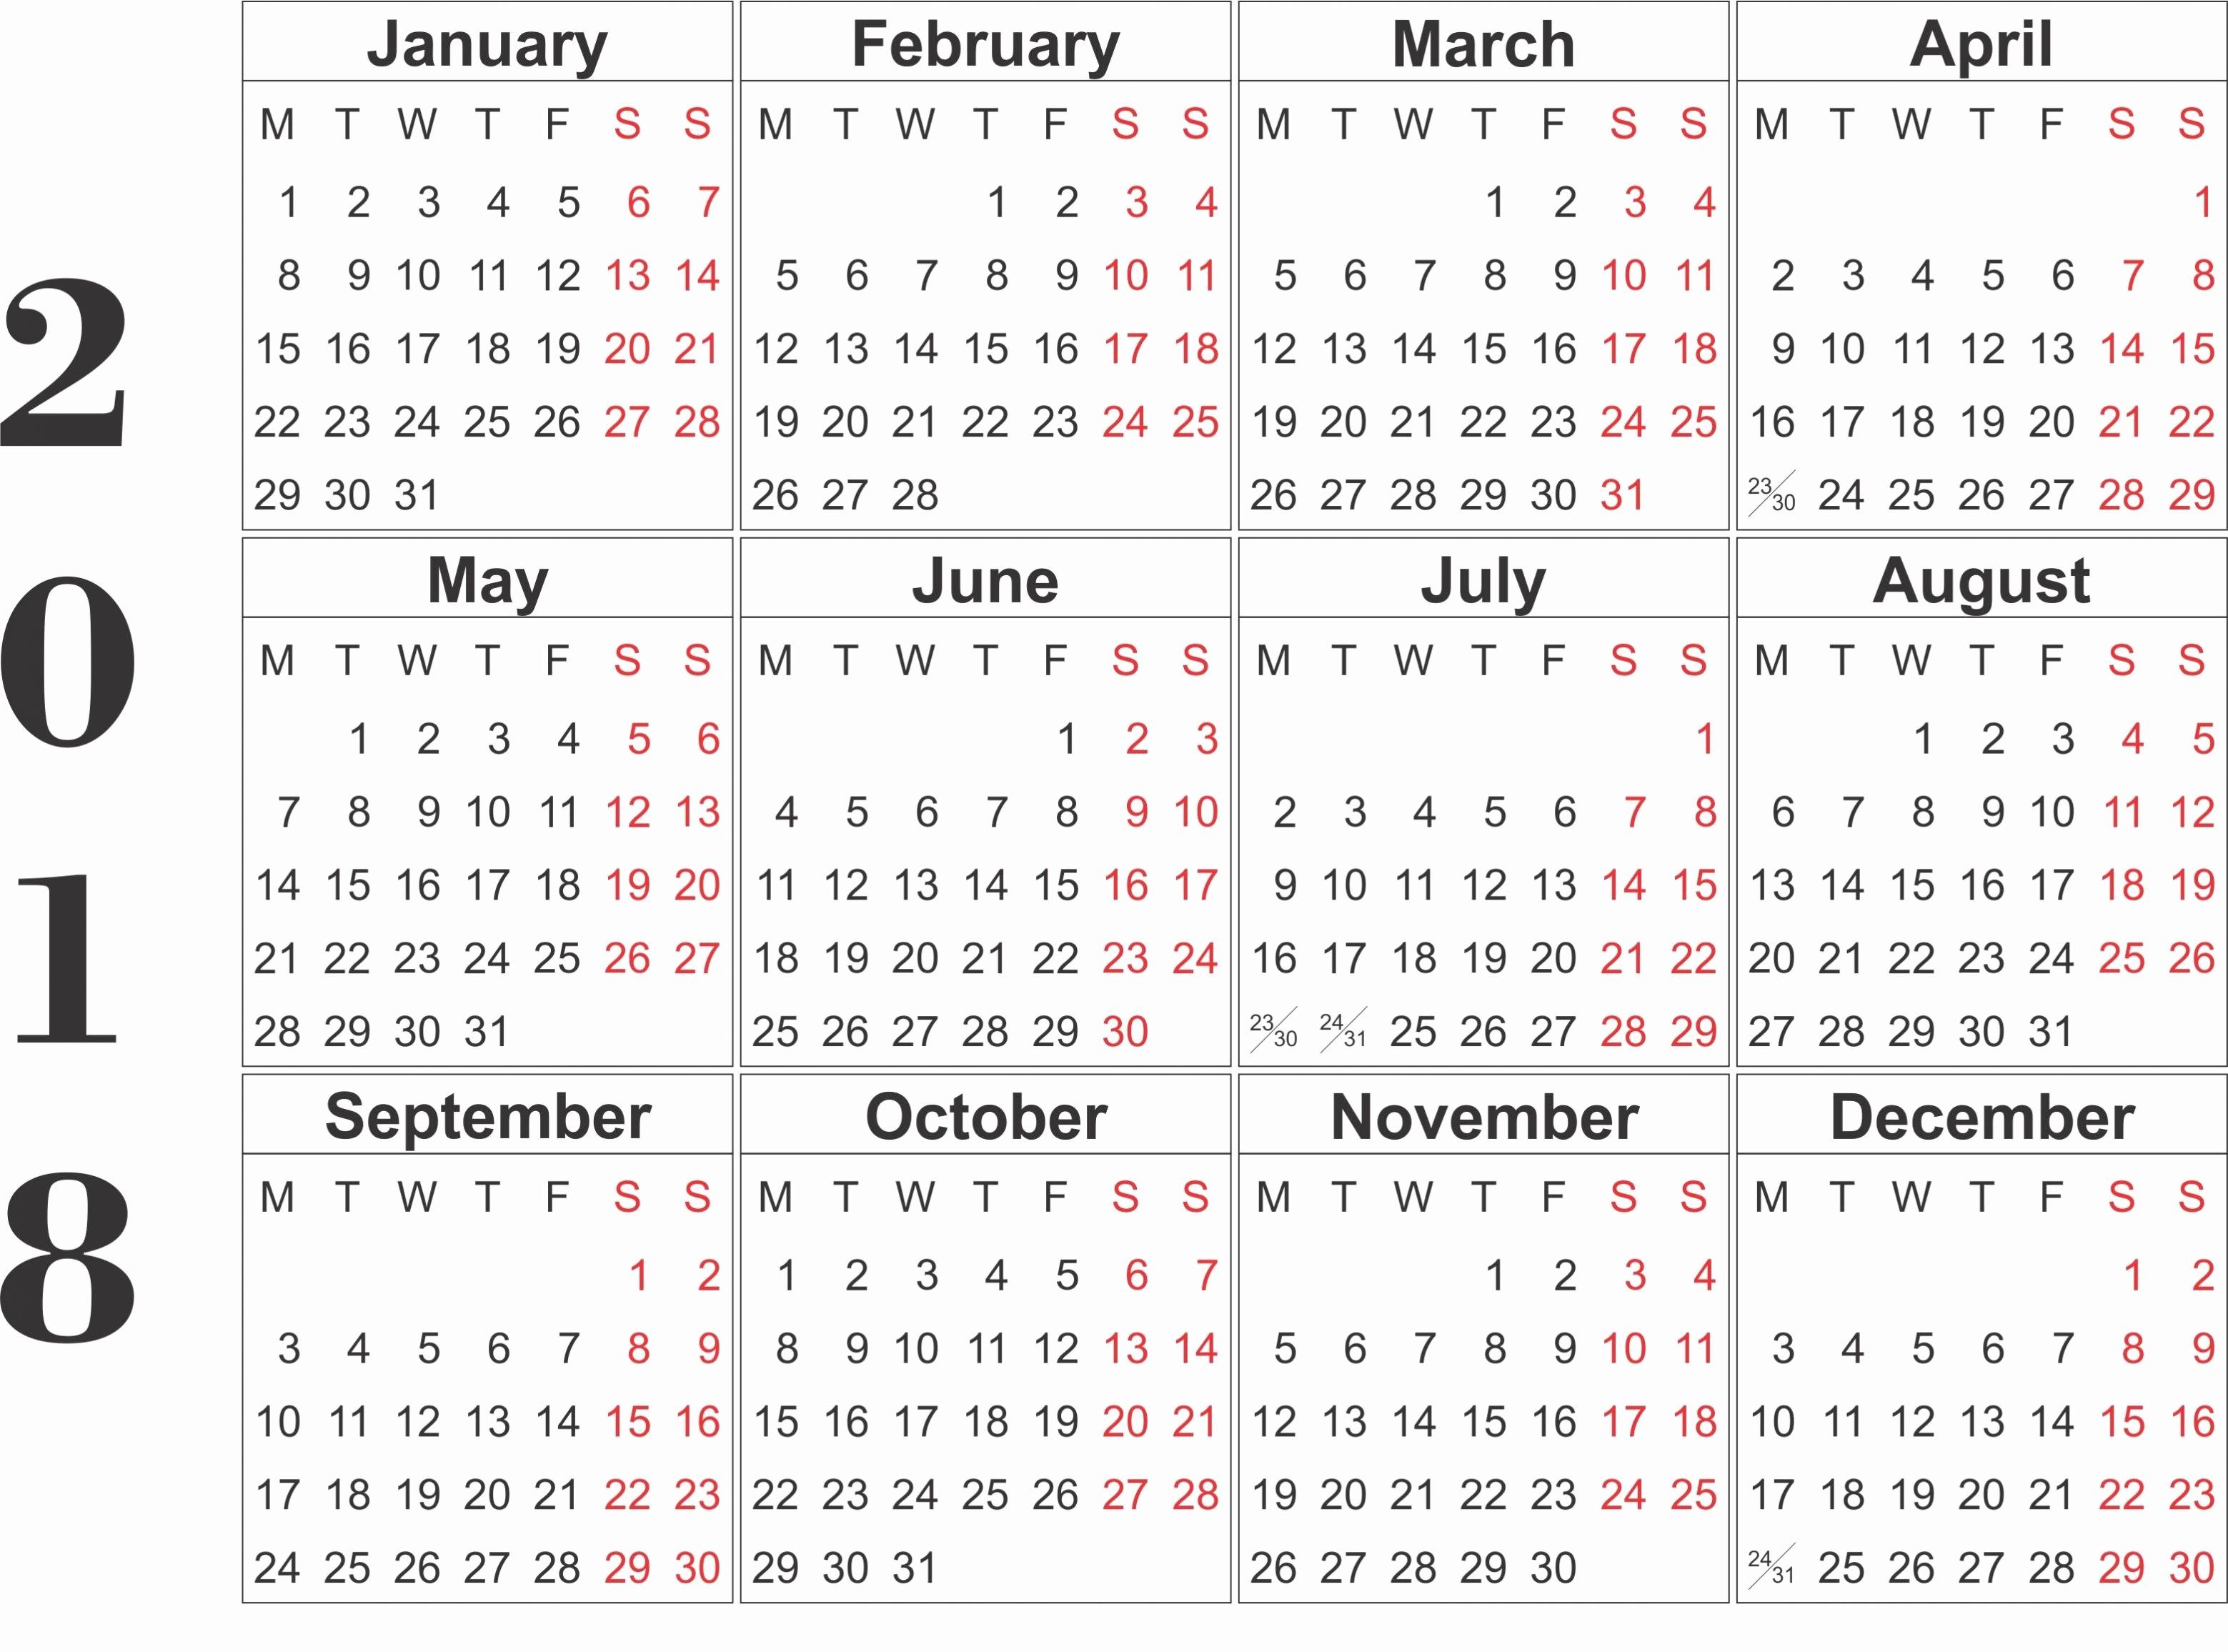 Free 2018 Monthly Calendar Template Fresh Free Printable 2018 Calendar Template Word Excel